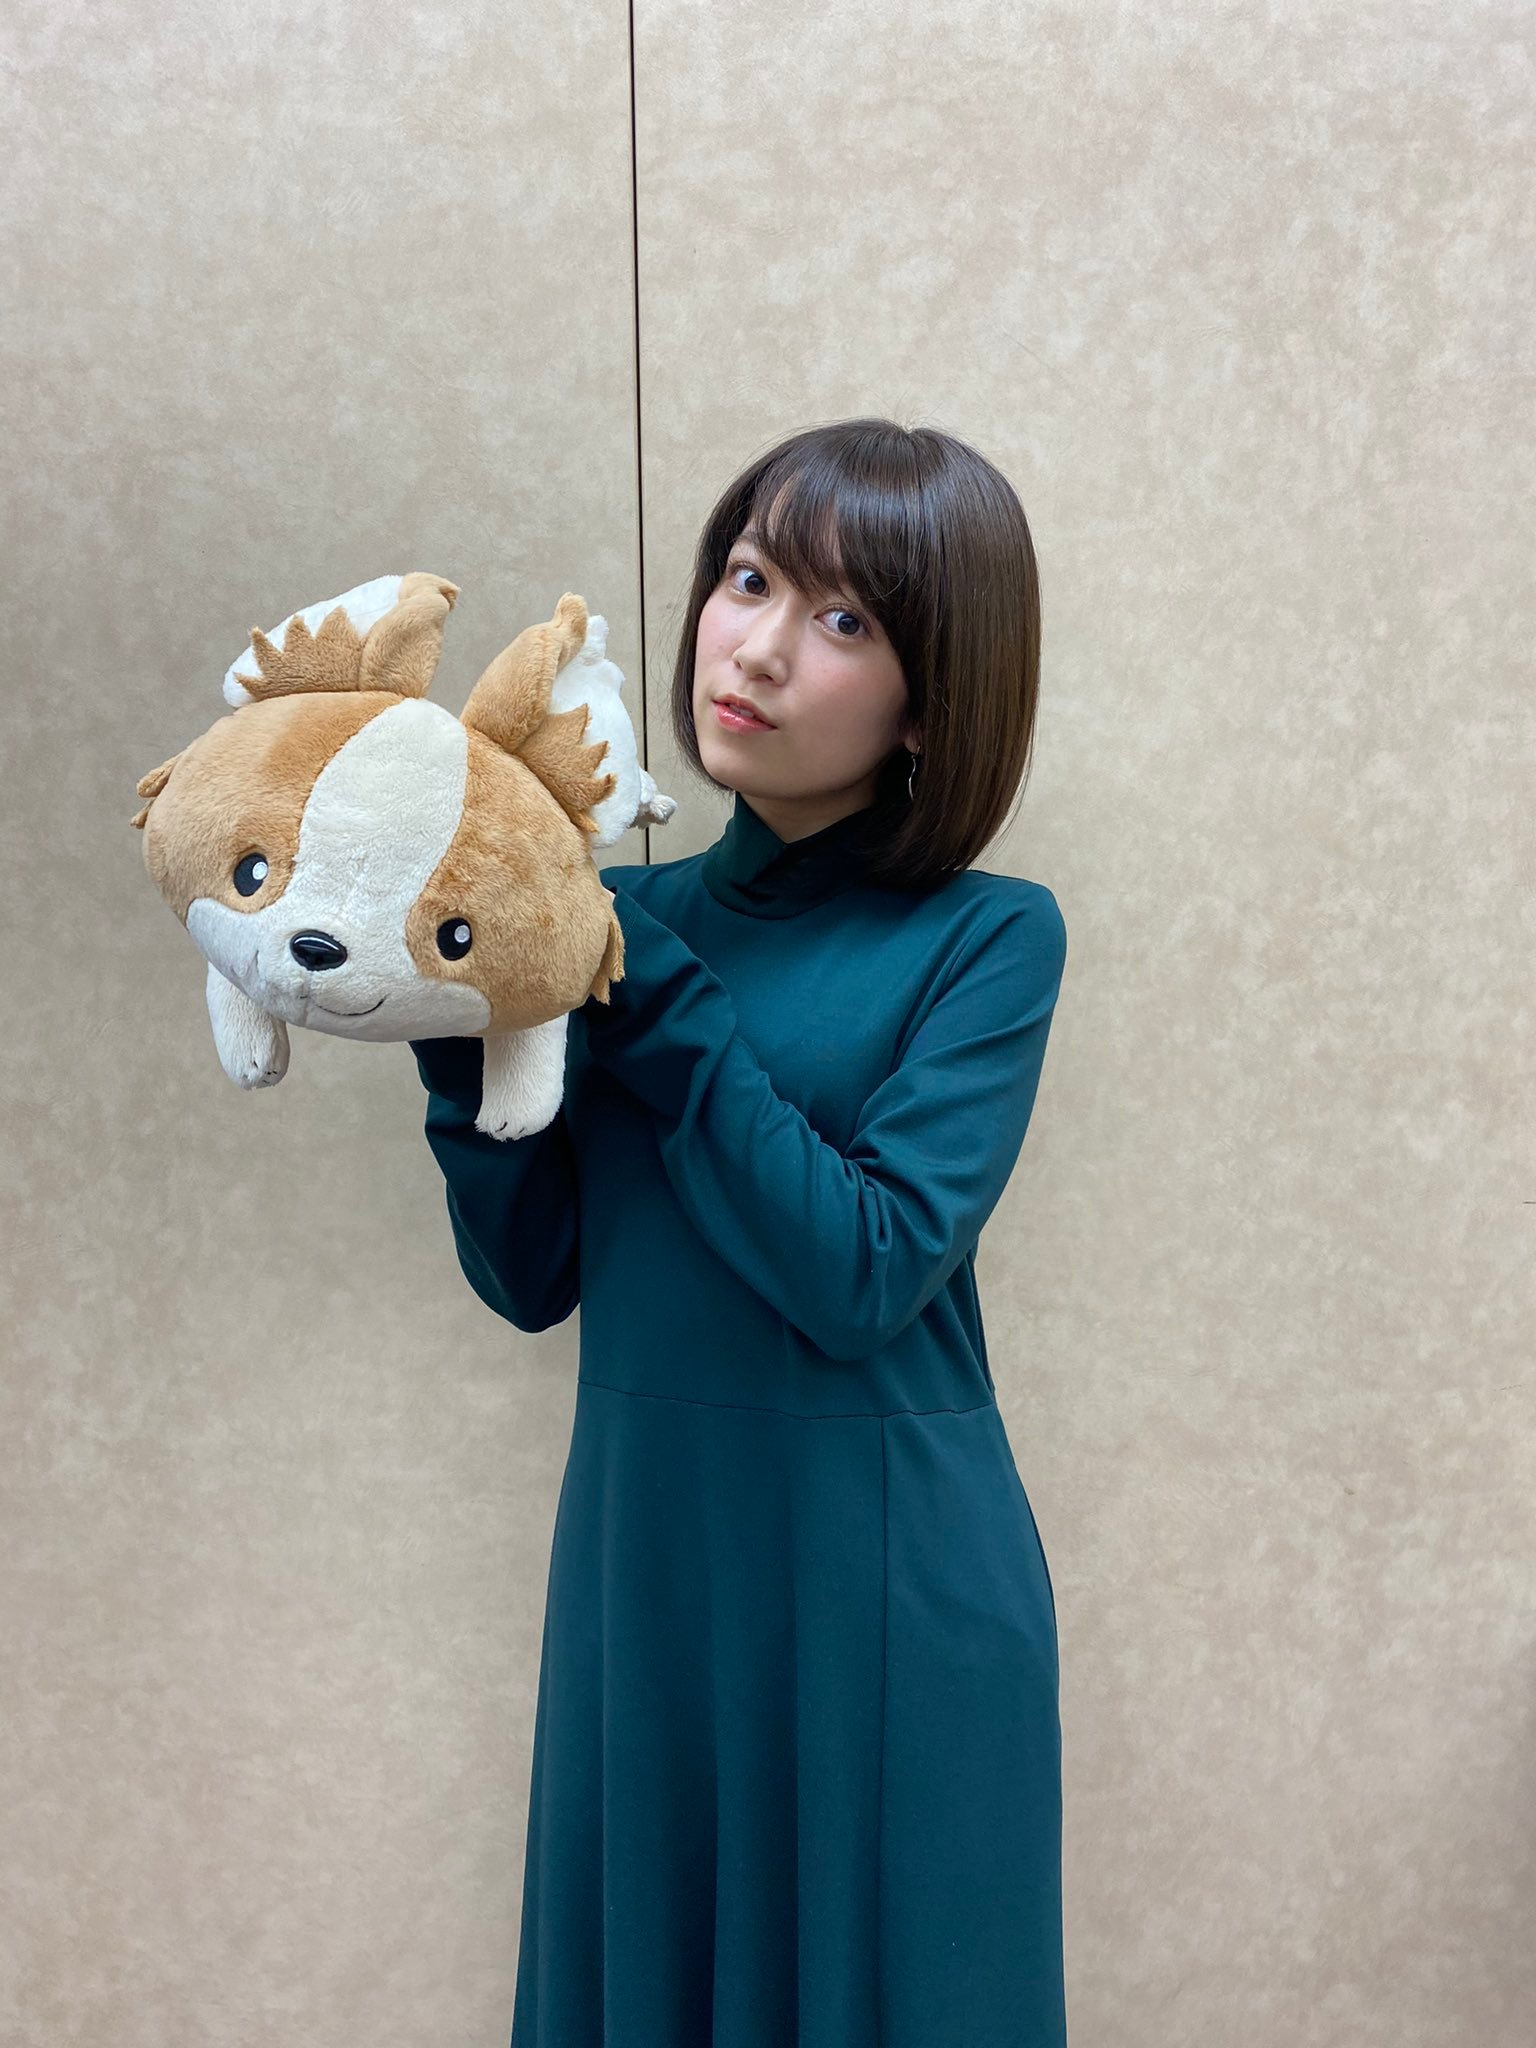 TomoyoKurosawa 1333005653225271296_p0